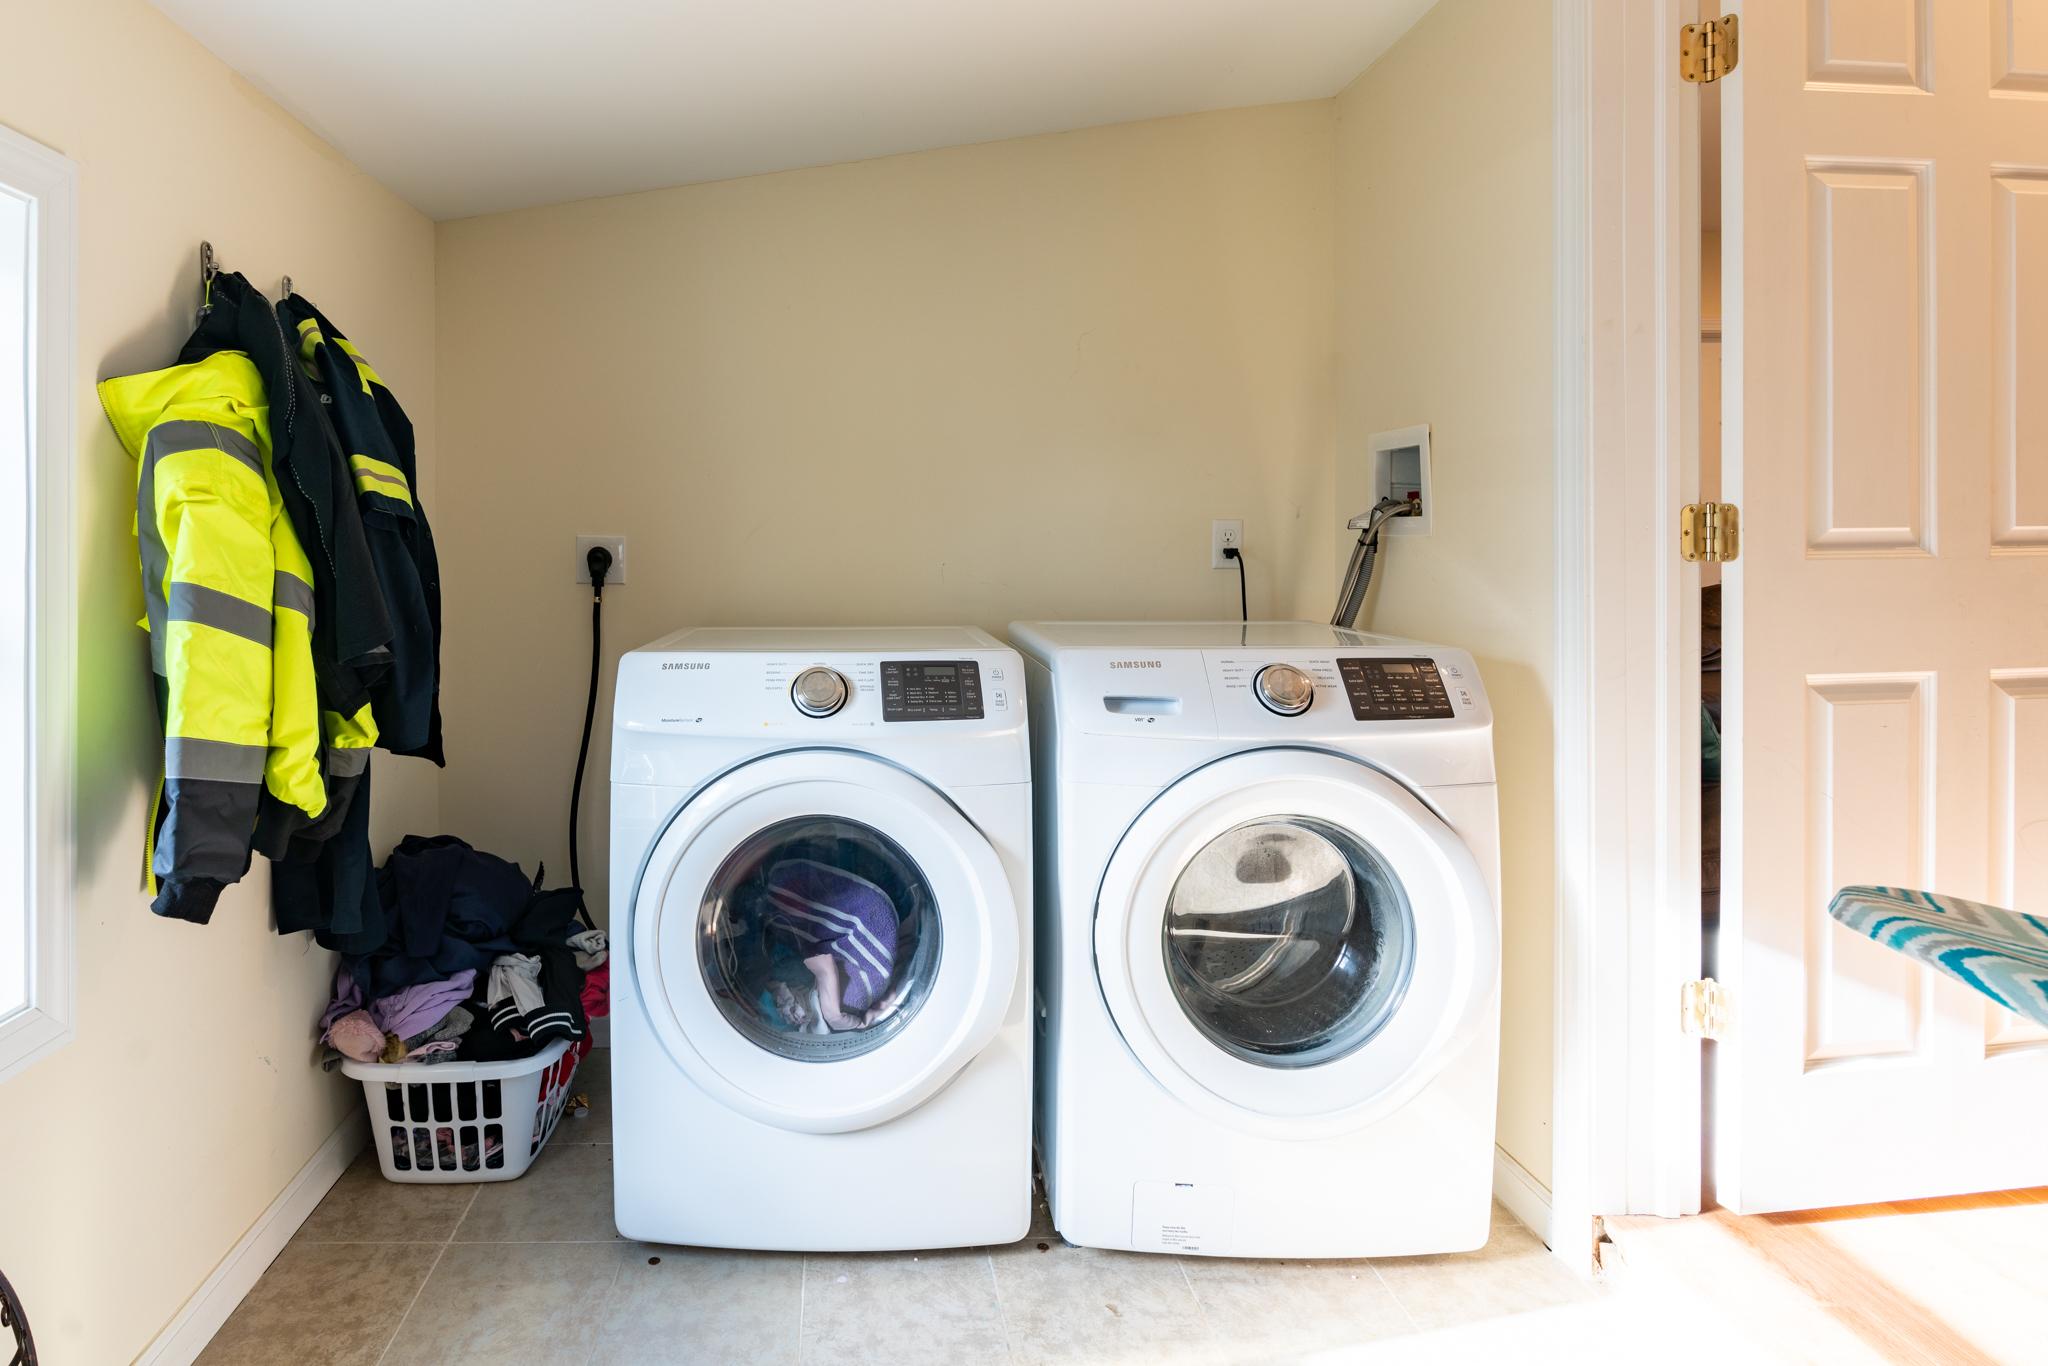 84 Mill Plain Ave Waterbury CT Laundry